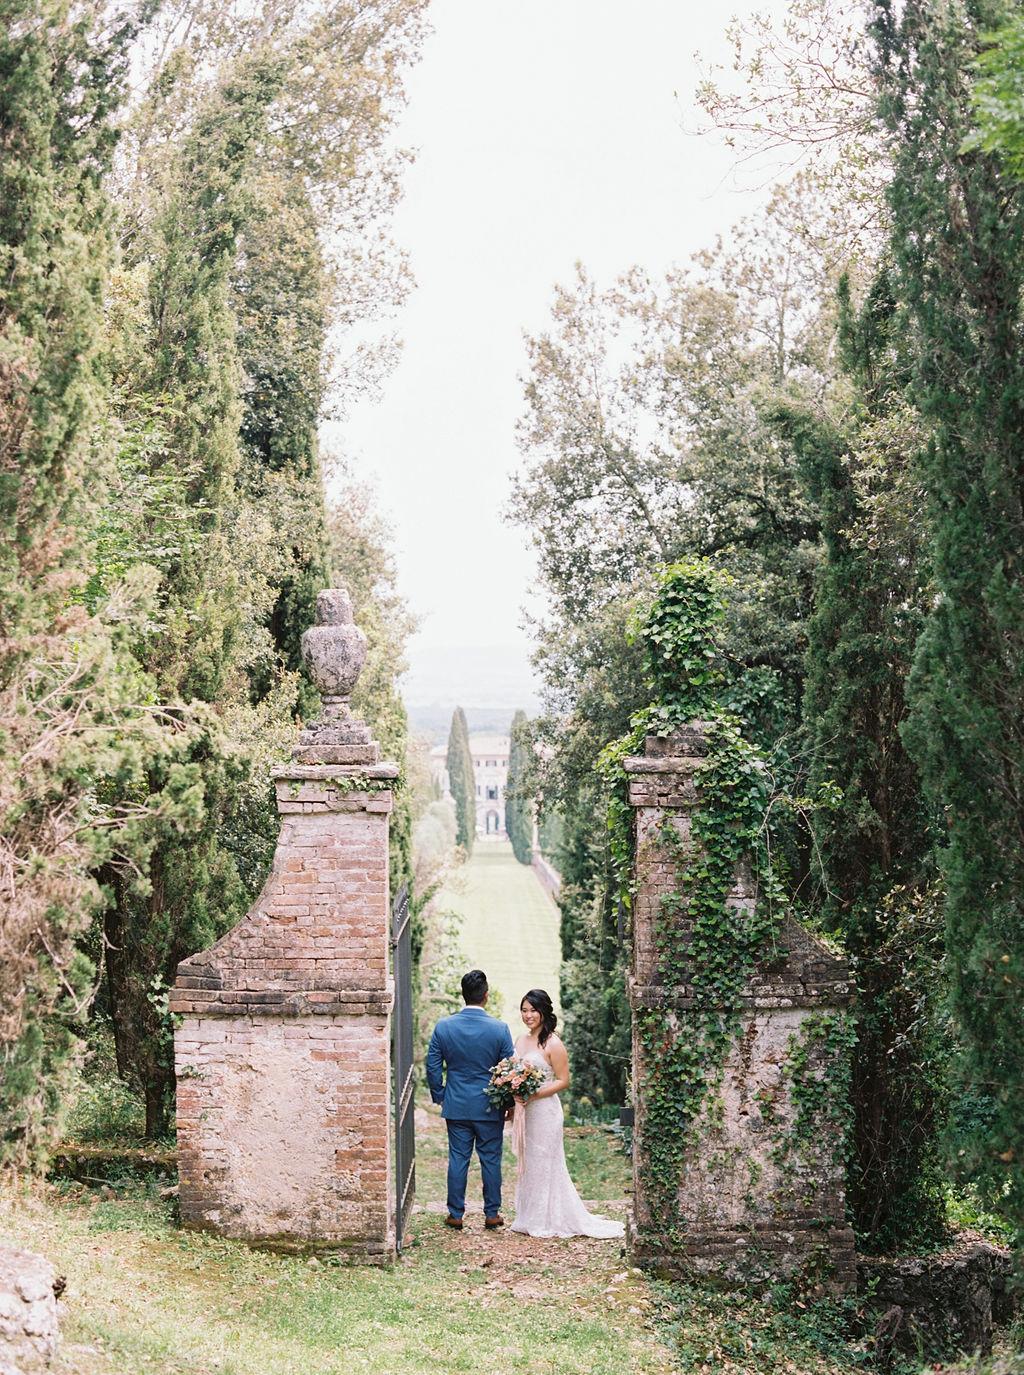 RACHEL & PETER  Siena, Italy — Katie Grant Photo